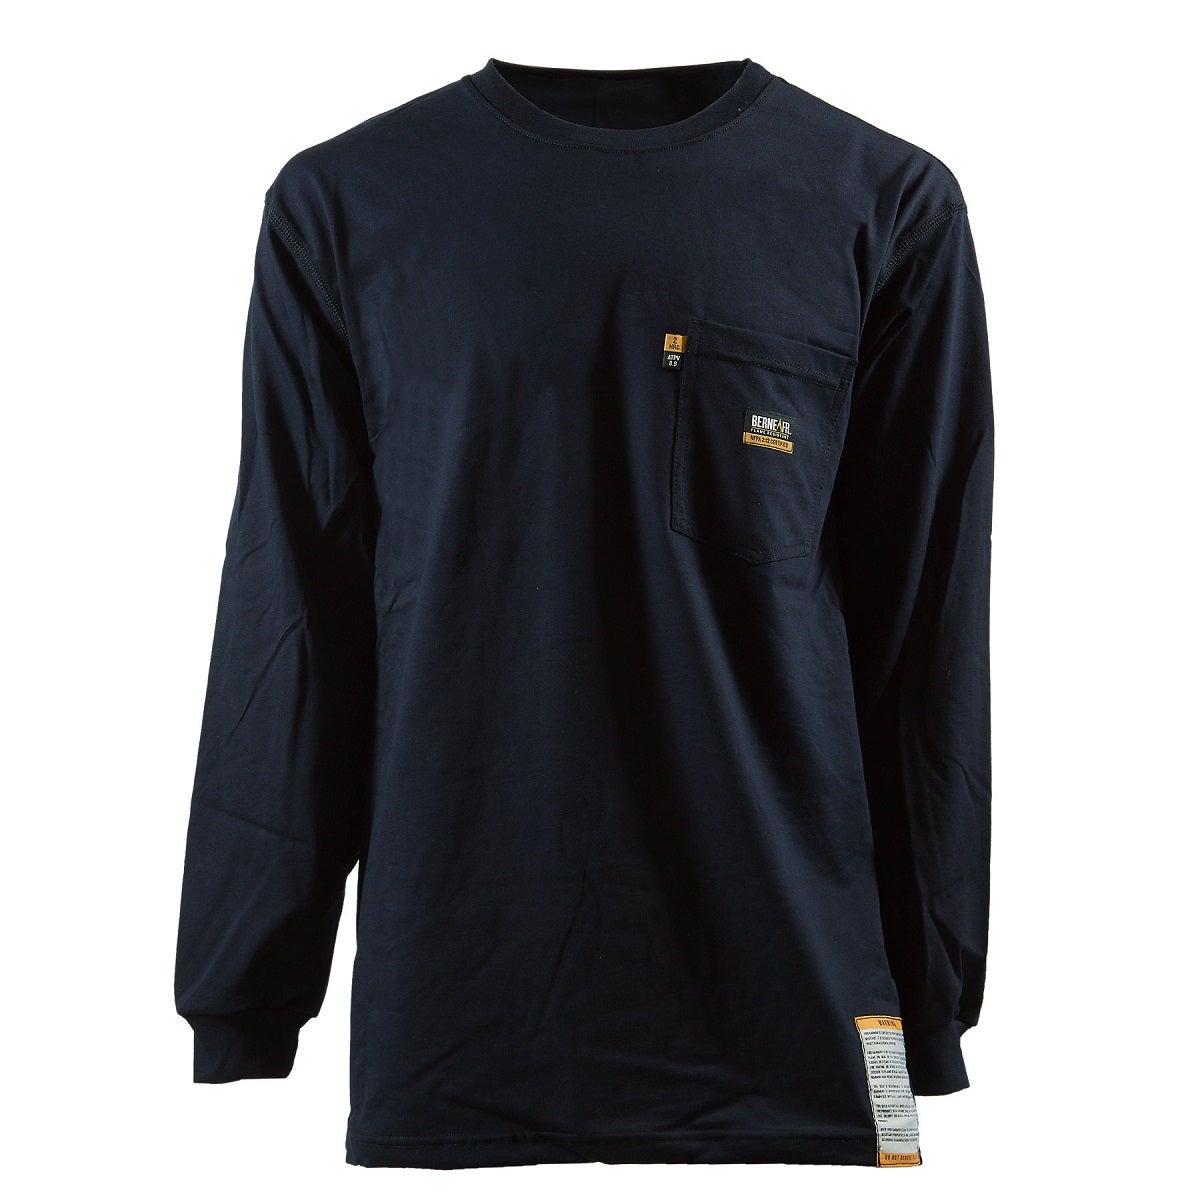 Berne Men 39 S Flame Resistant Crew Neck Long Sleeve T Shirt